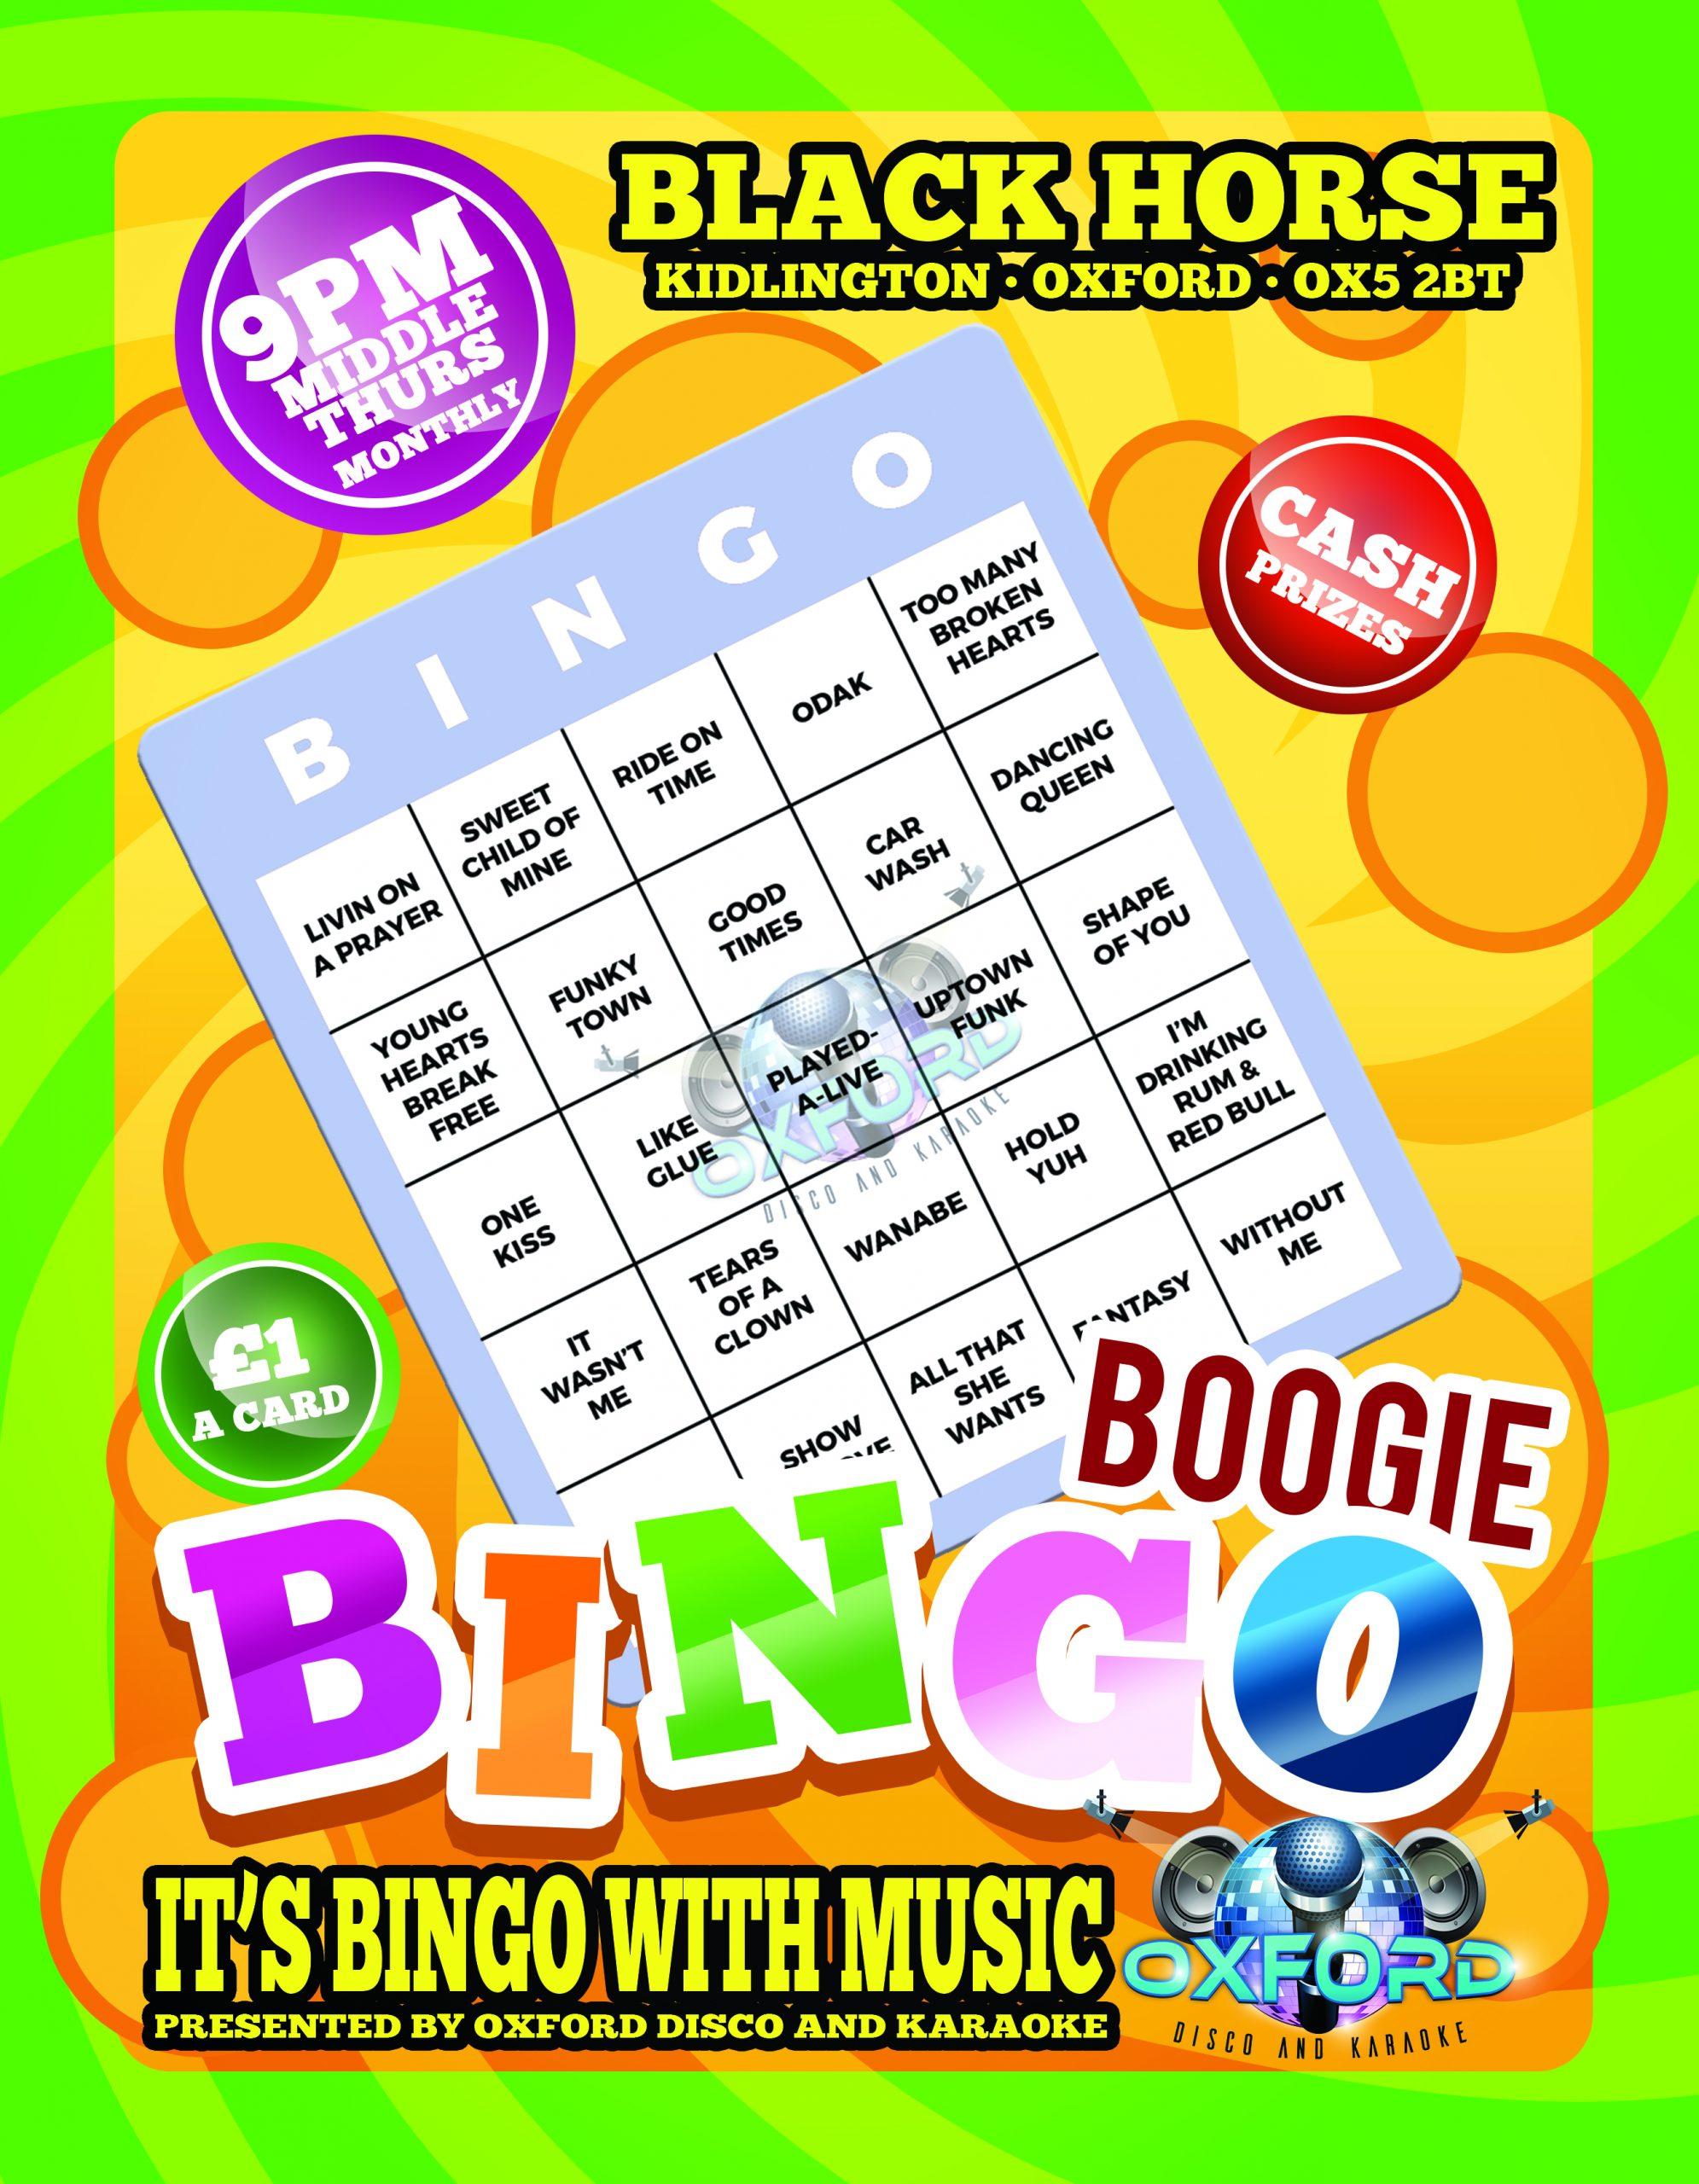 Oxford Disco and Karaoke - Black Horse Boogie Bingo Outside